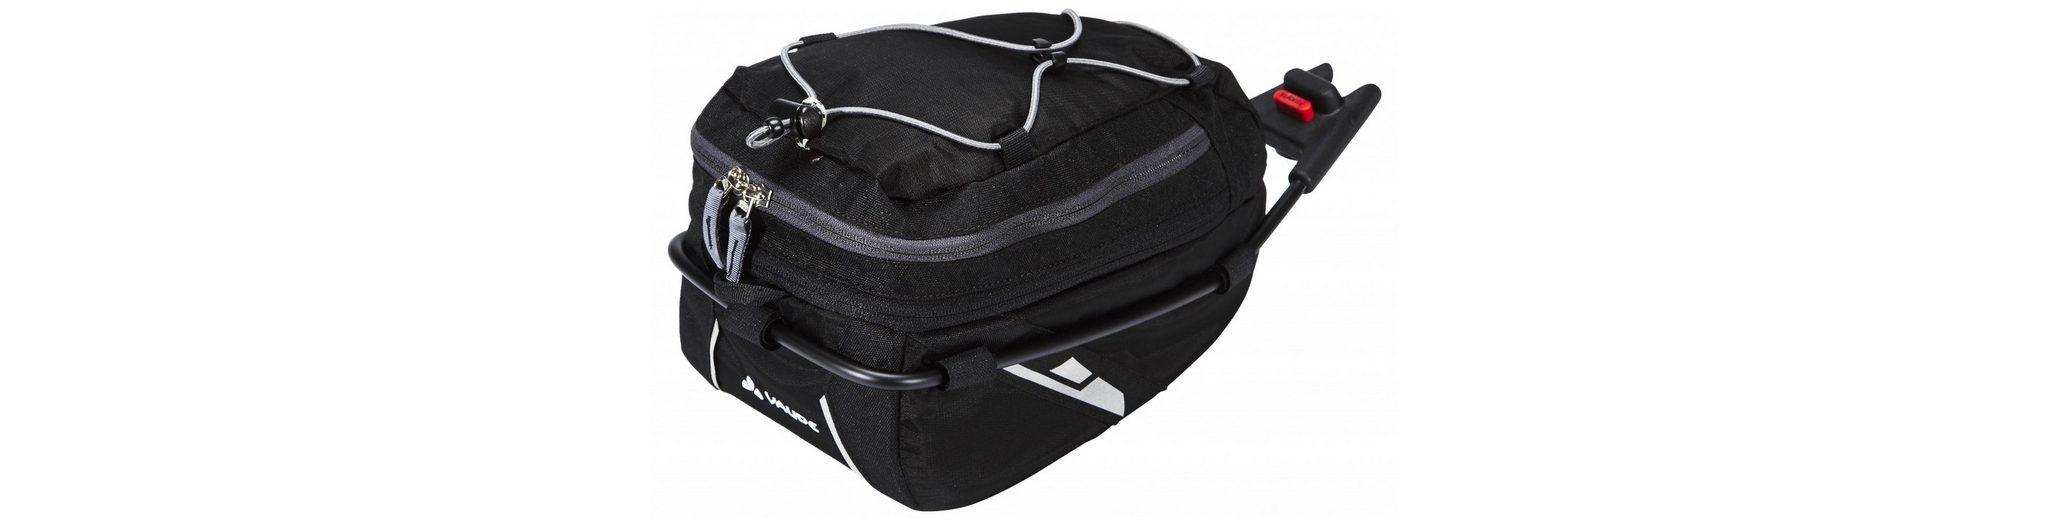 VAUDE Gepäckträgertasche »Off Road S Saddlebag«